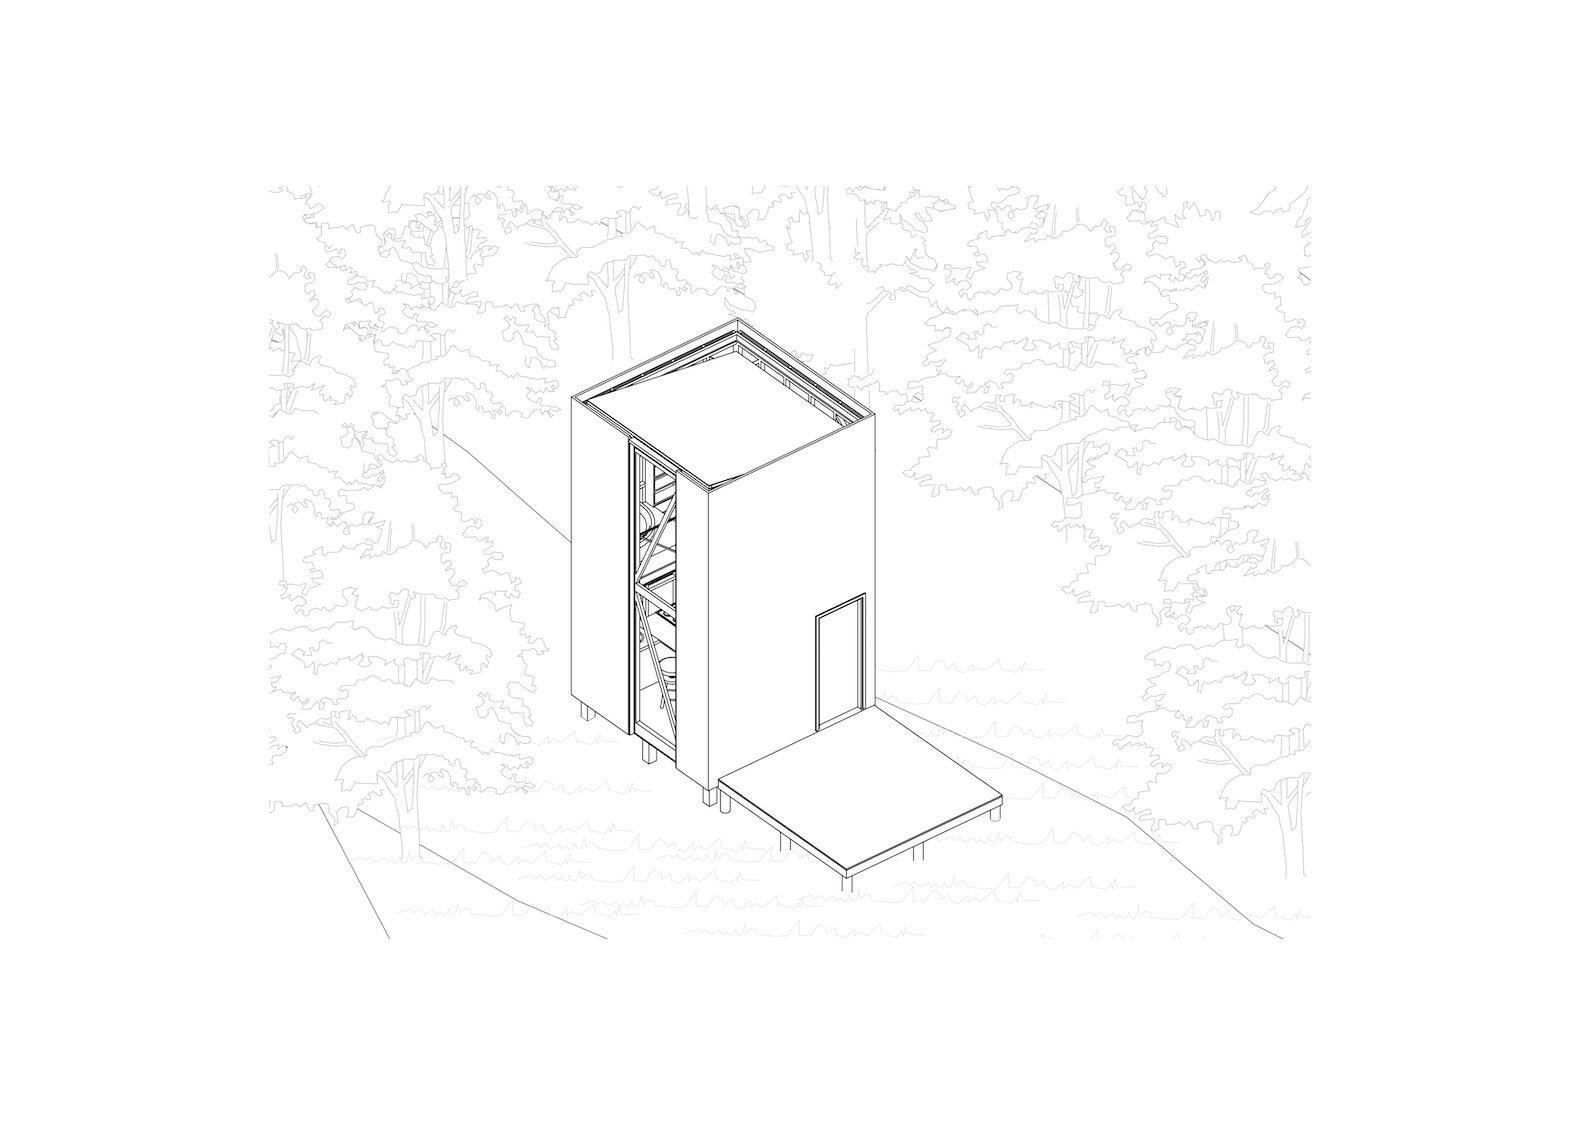 Refugio 3 x 3 isometric diagram